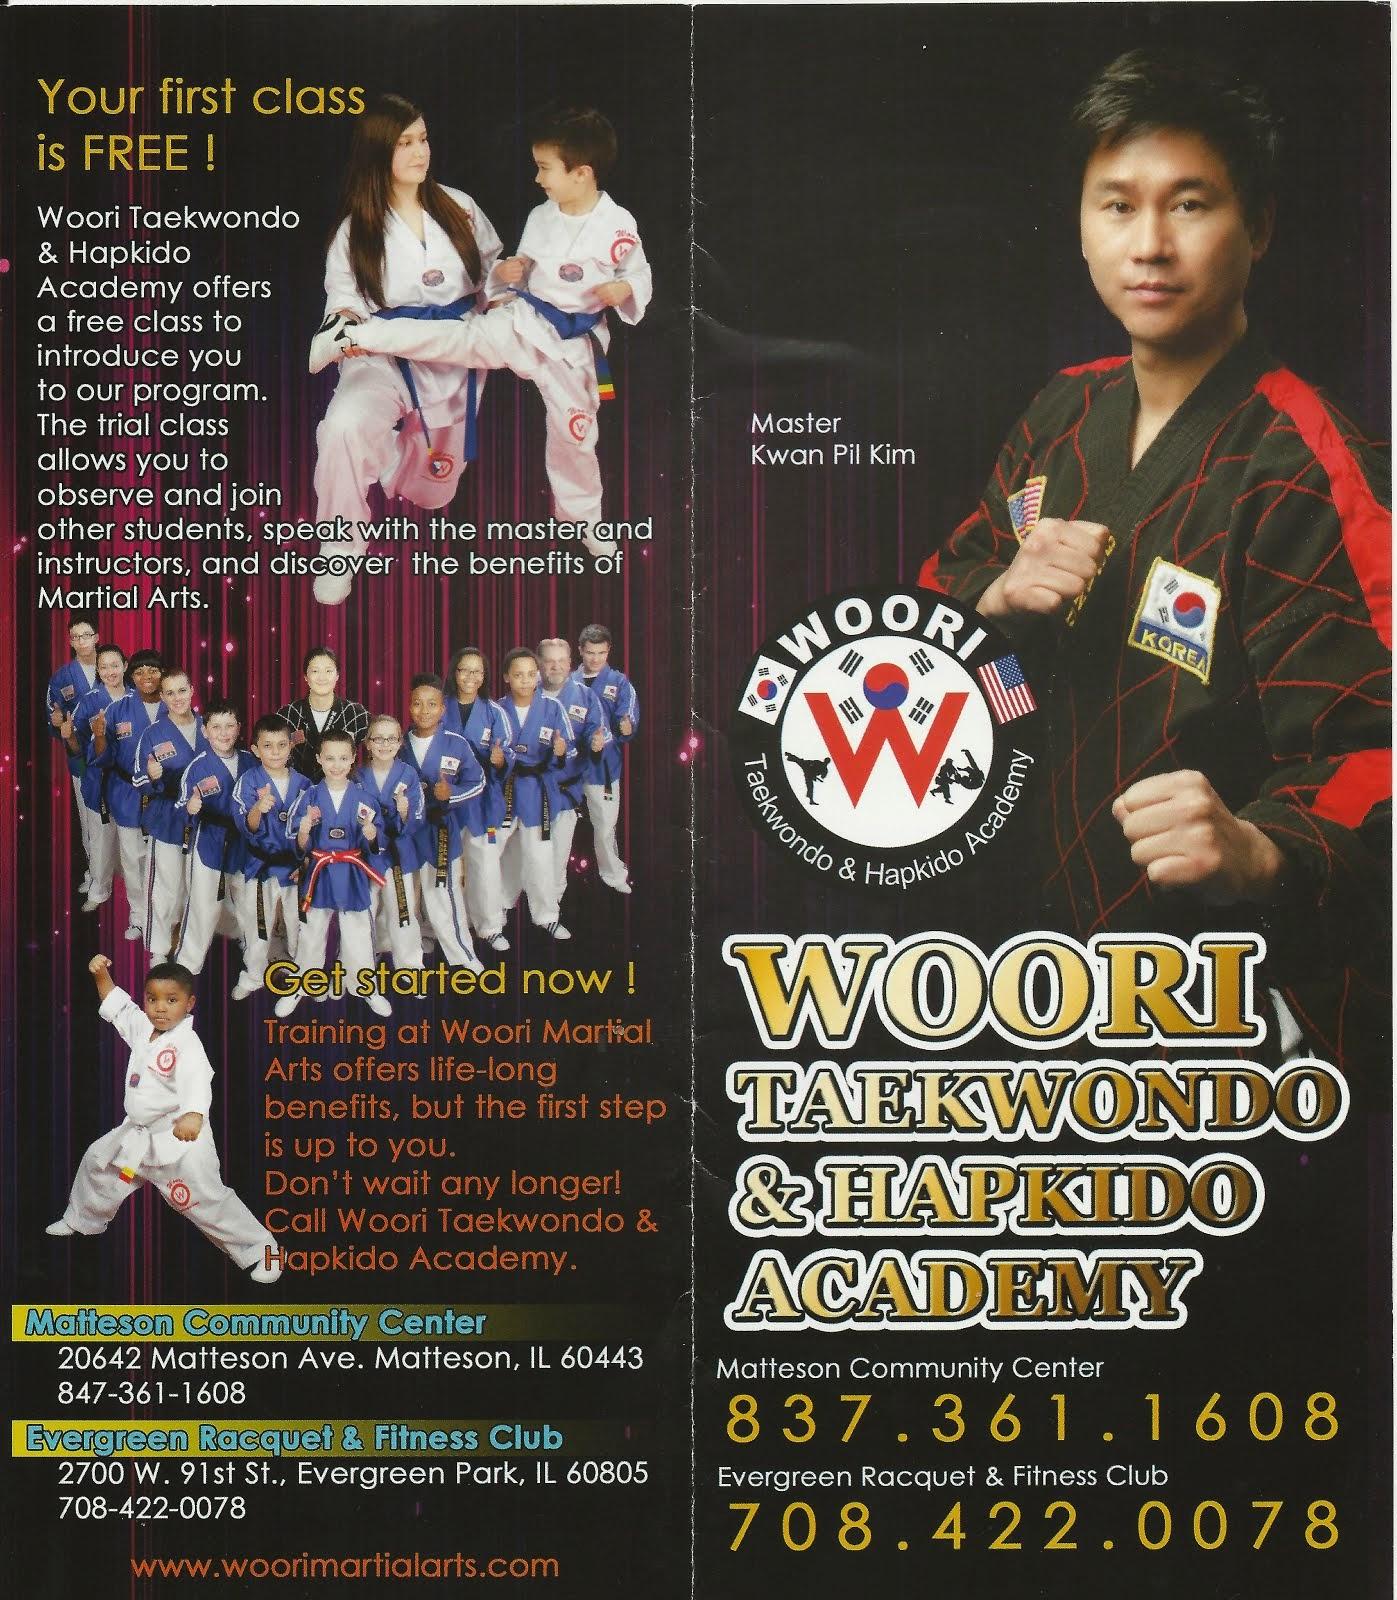 Woori Taekwondo & Hapkido Academy